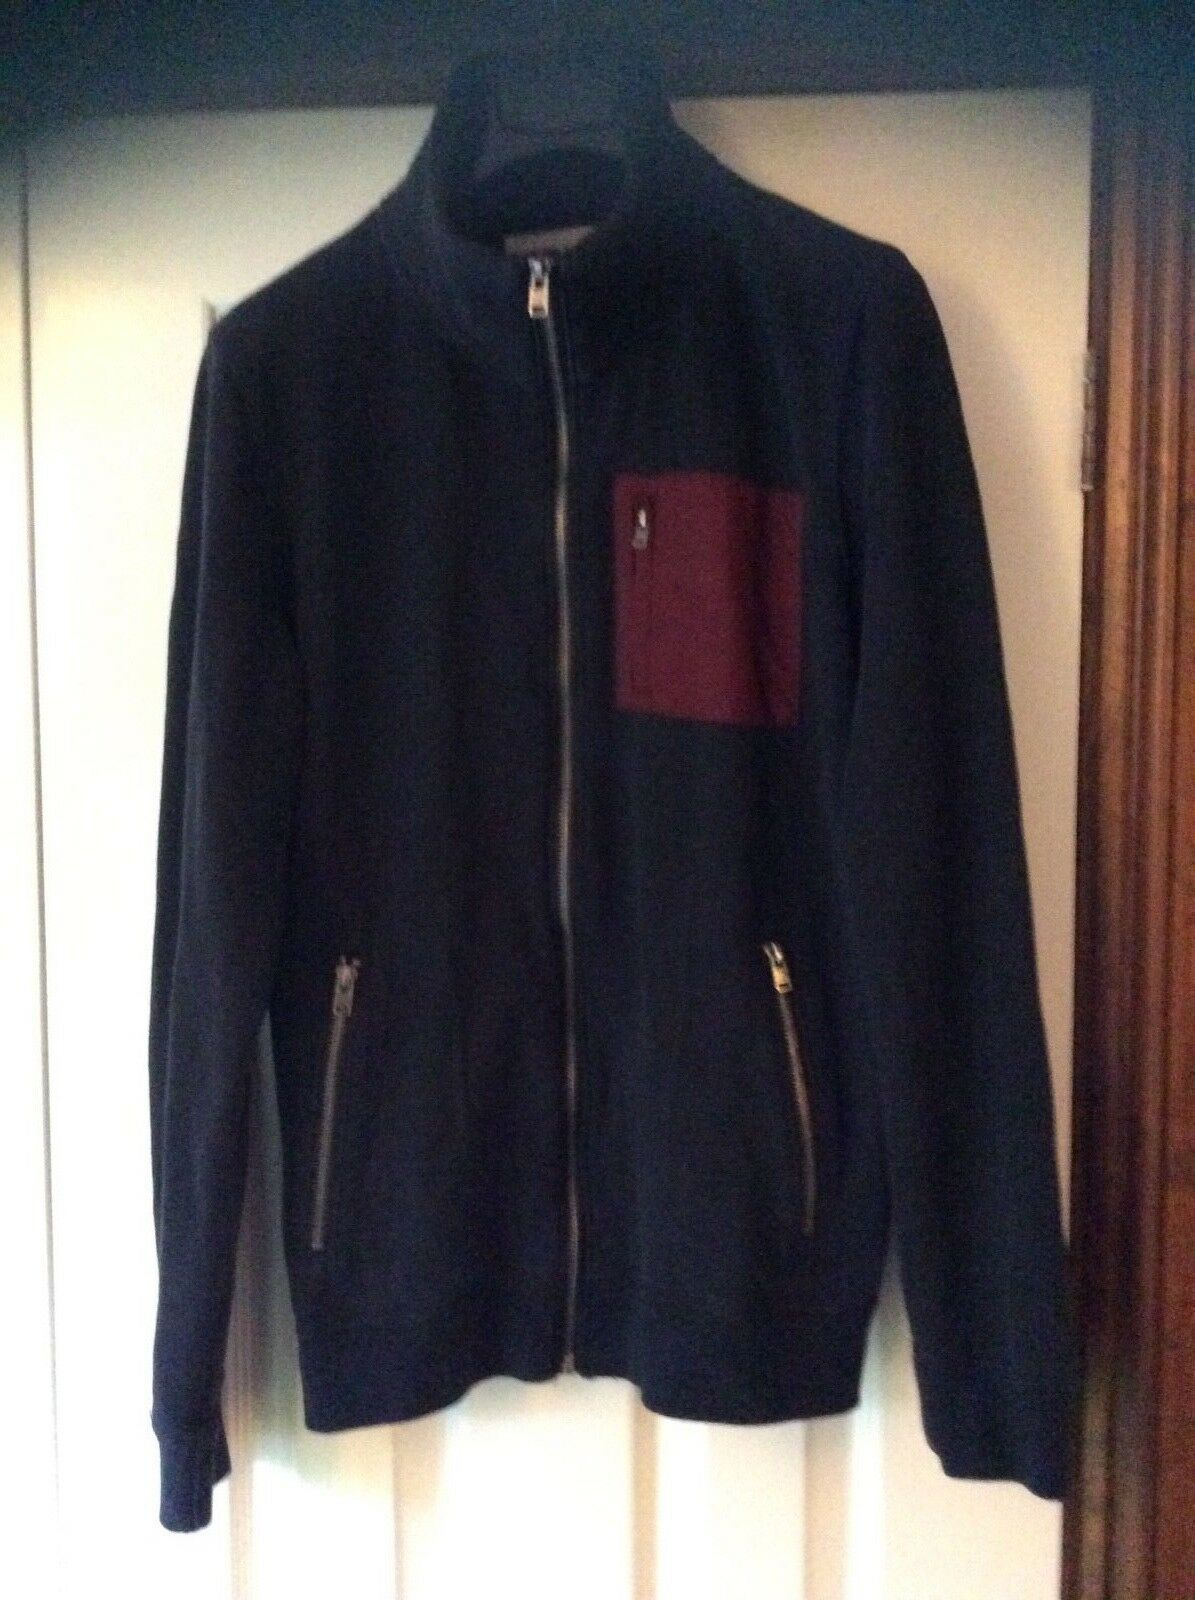 Mens Navy Hollister Jacket/Top Small